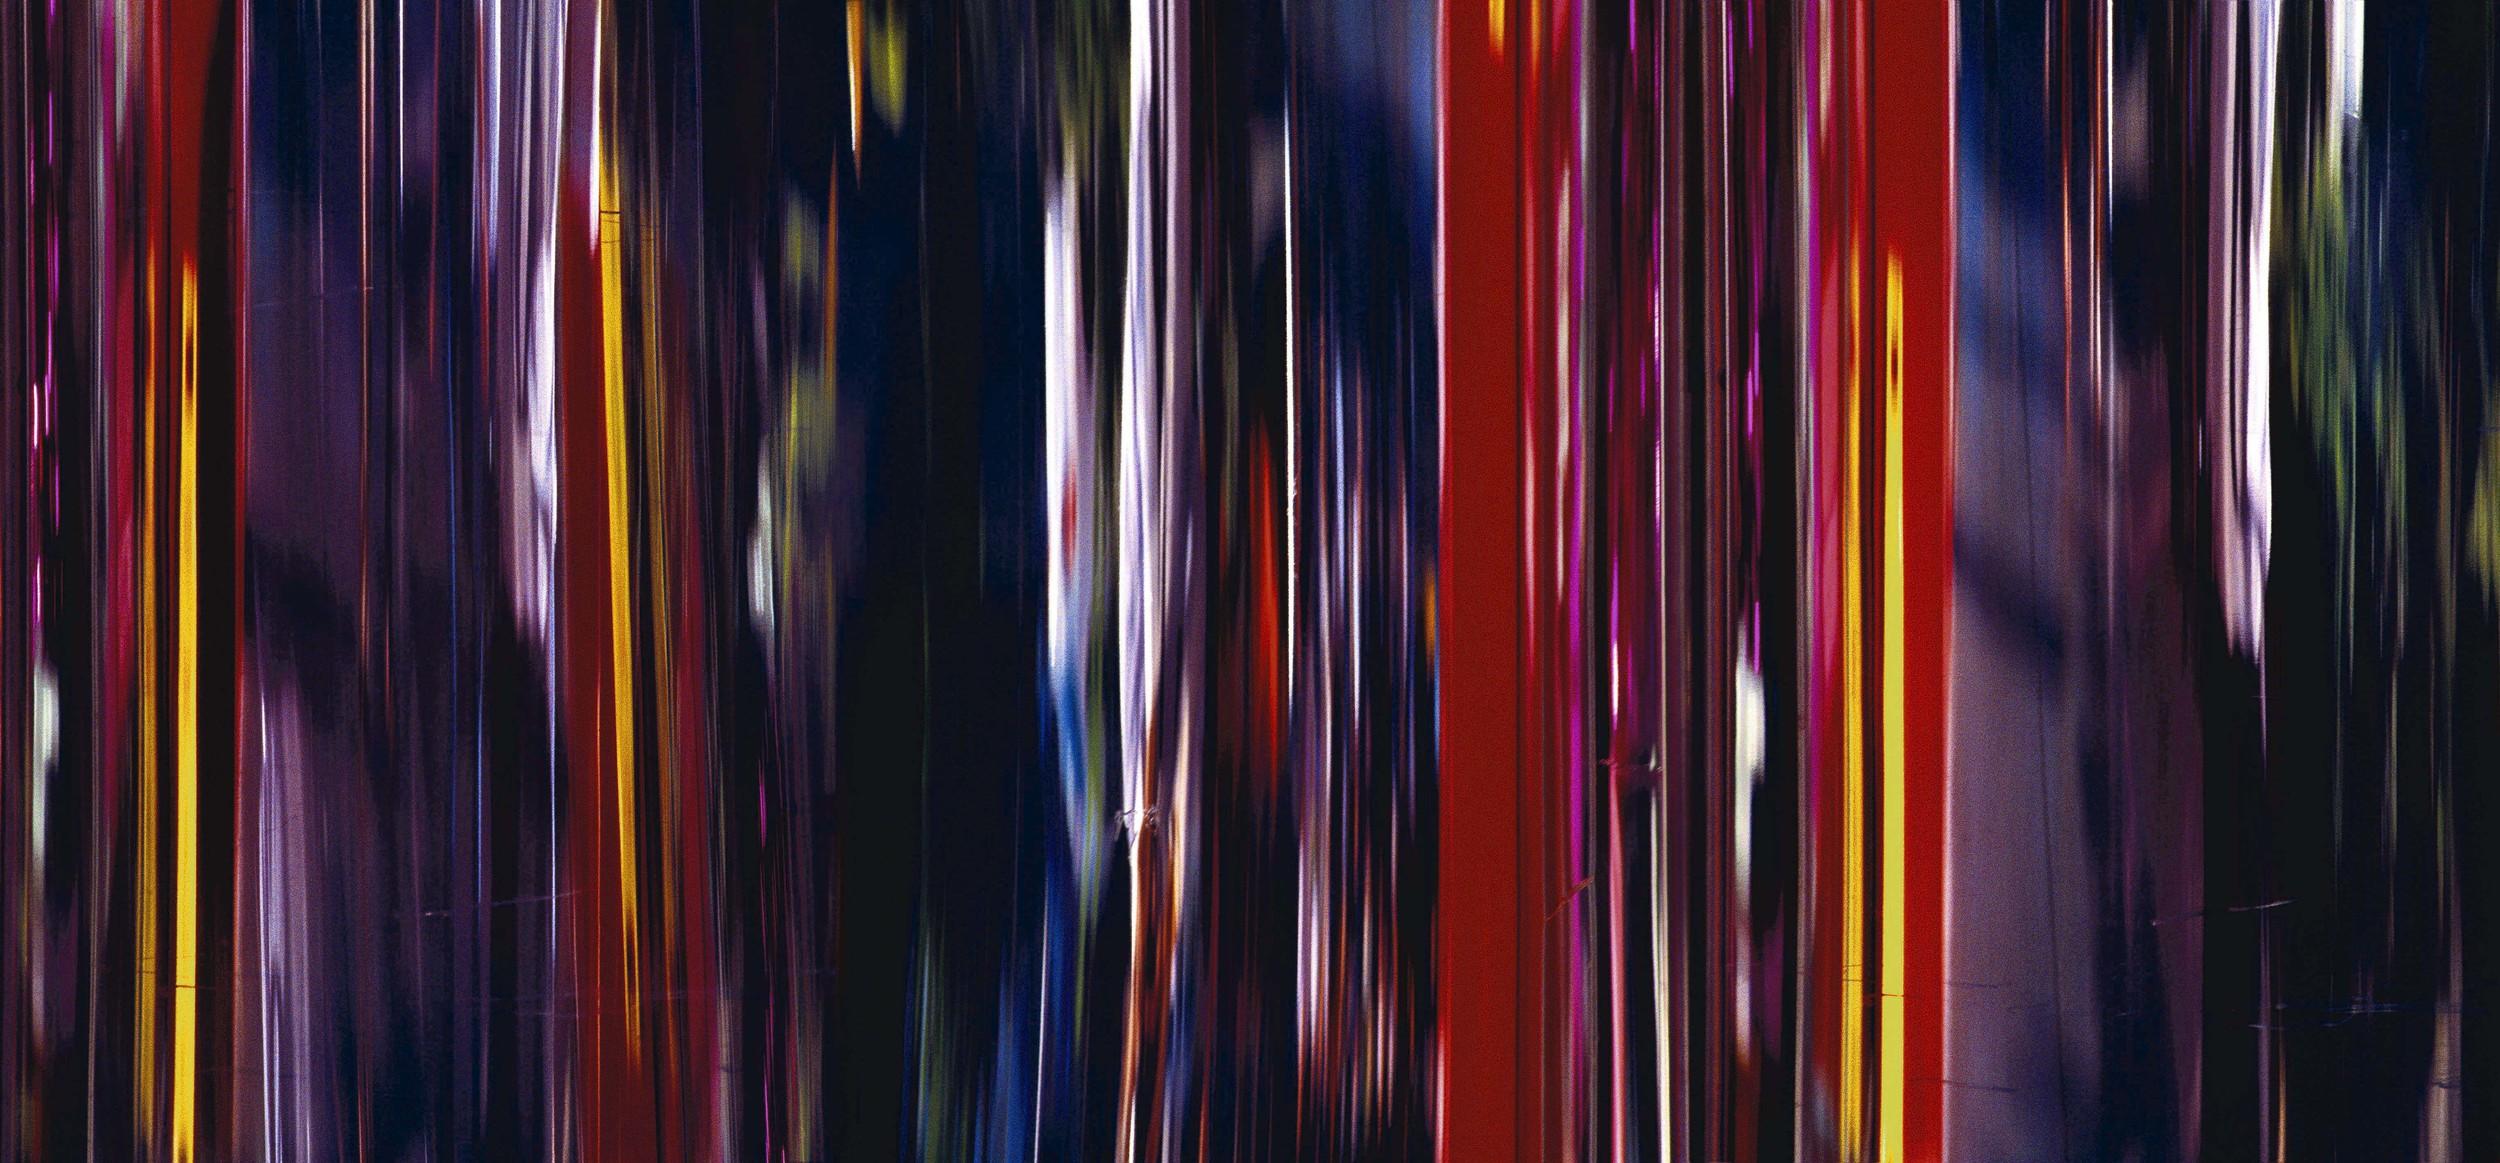 Colorism-OD-MP-110x215-2s8-0614.jpg